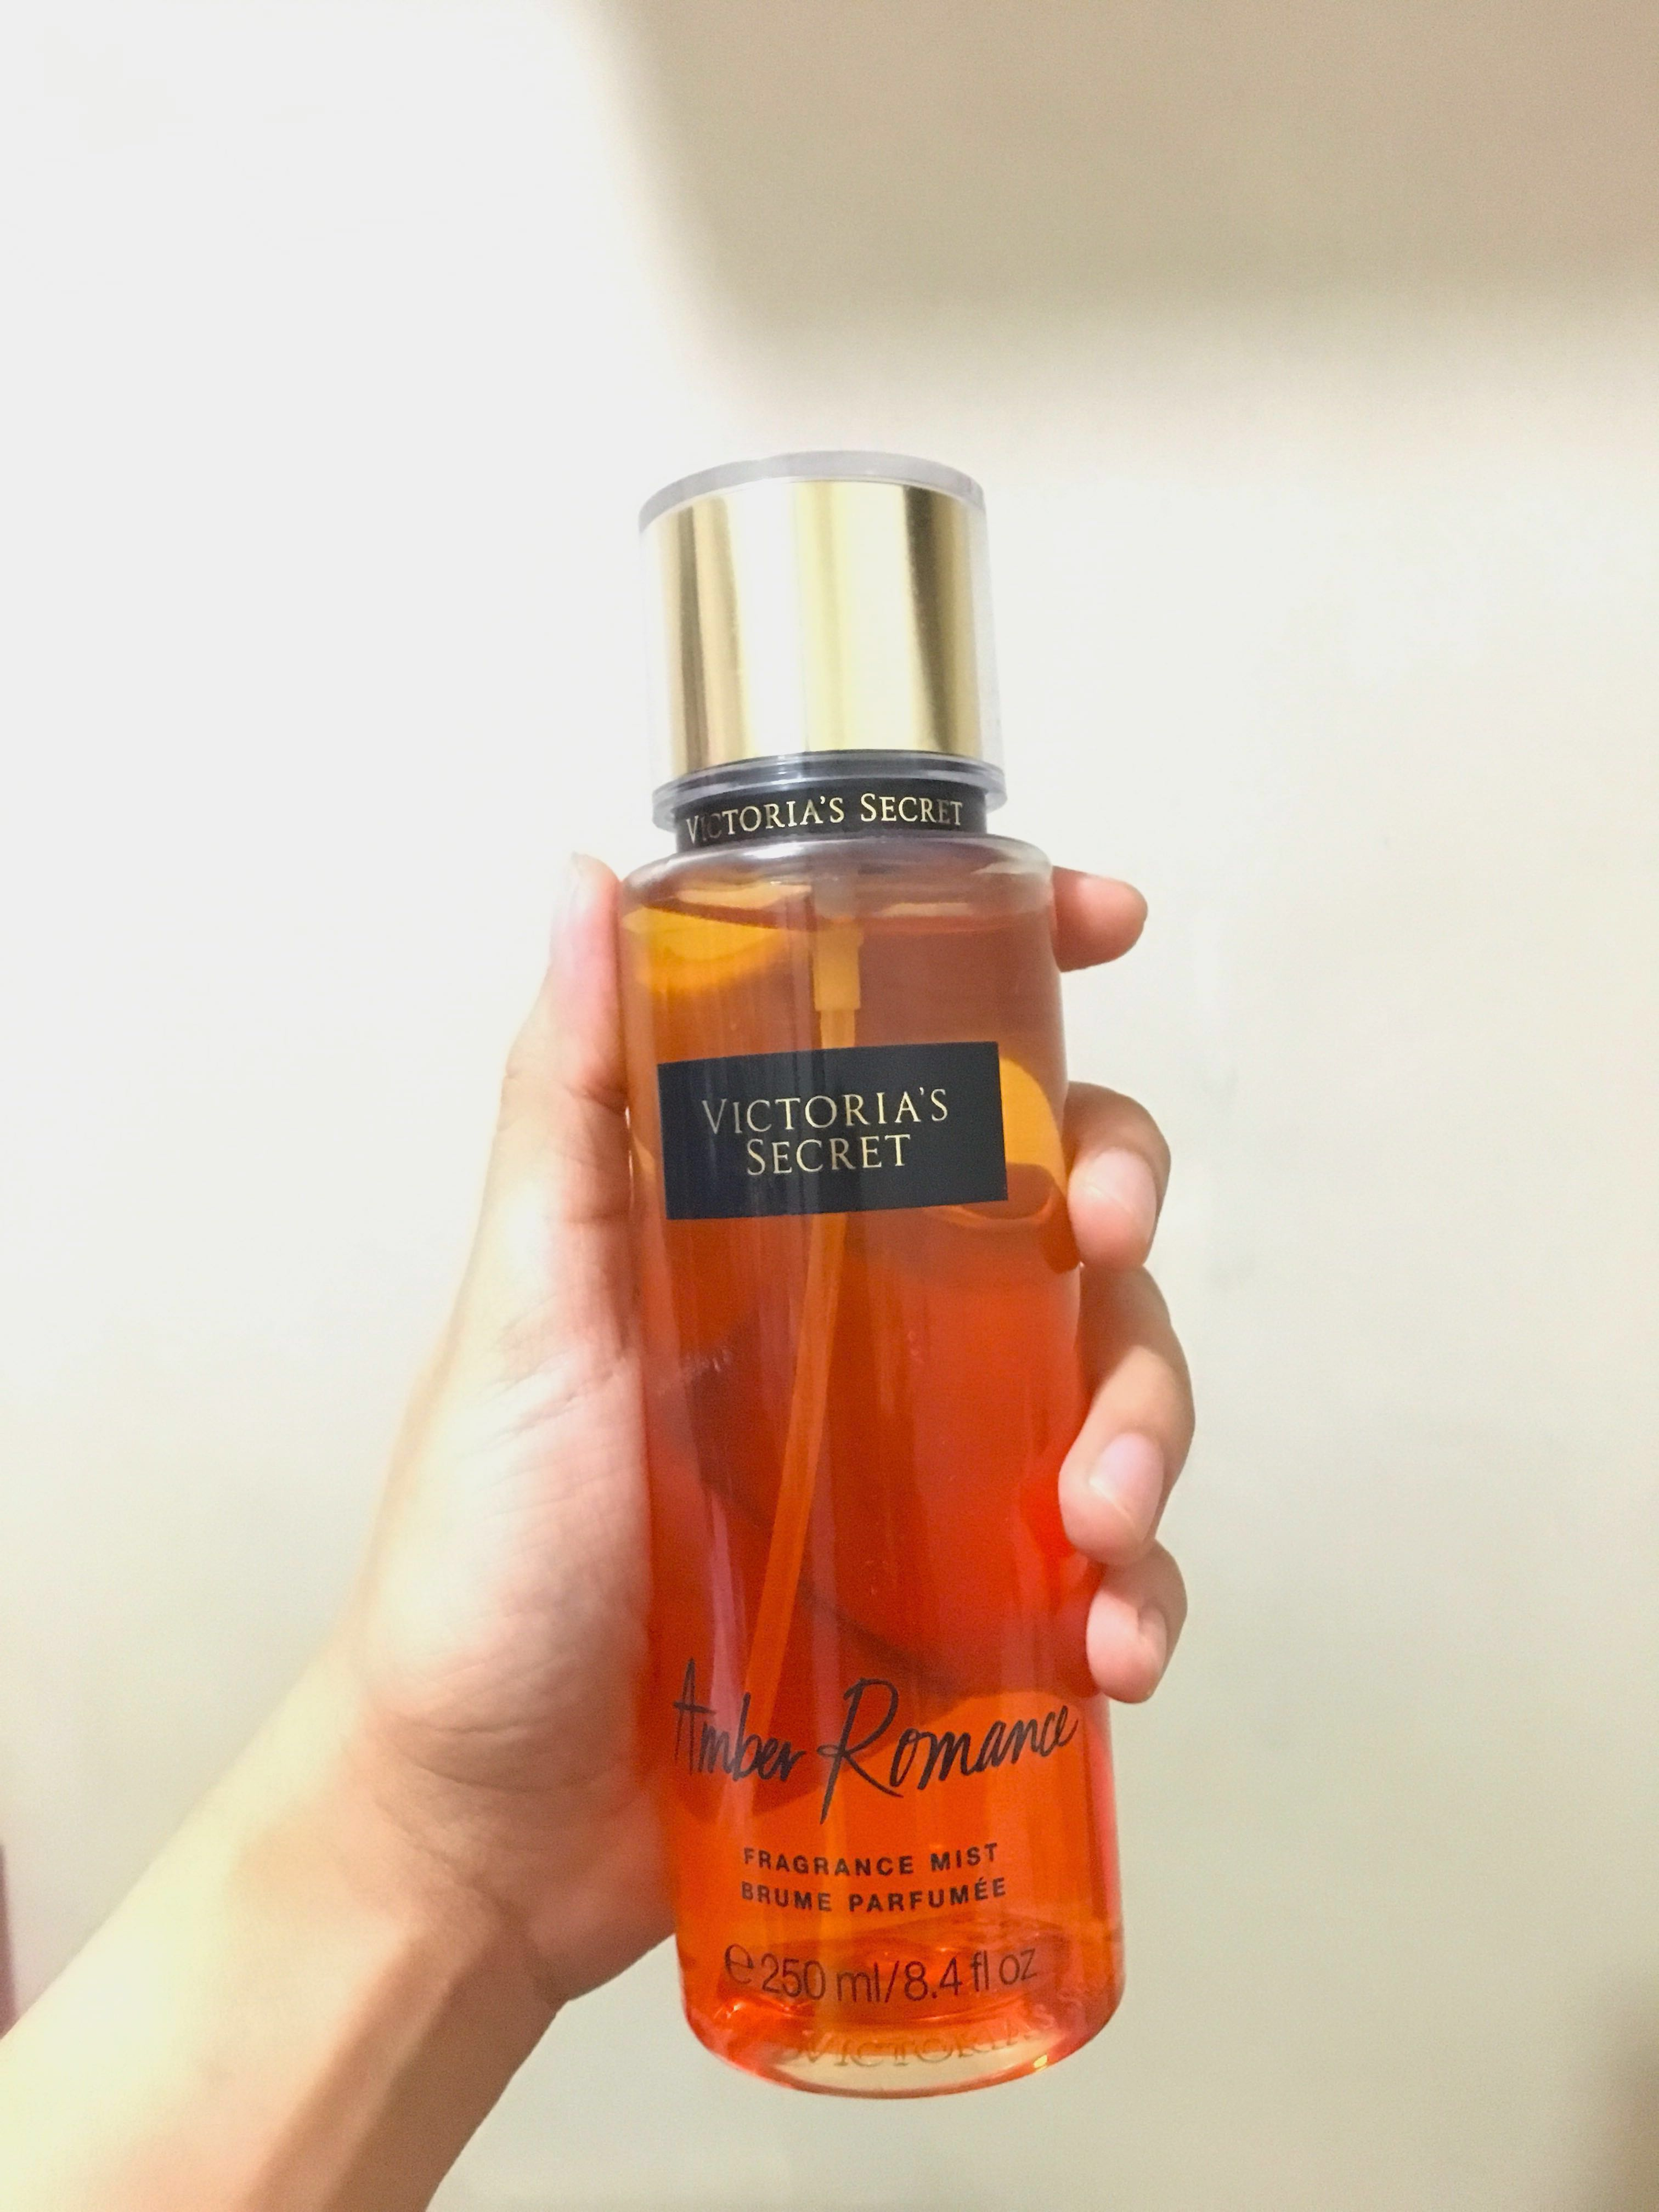 2c6b55b899 Victoria s Secret Fragrance Mist in Amber Romance